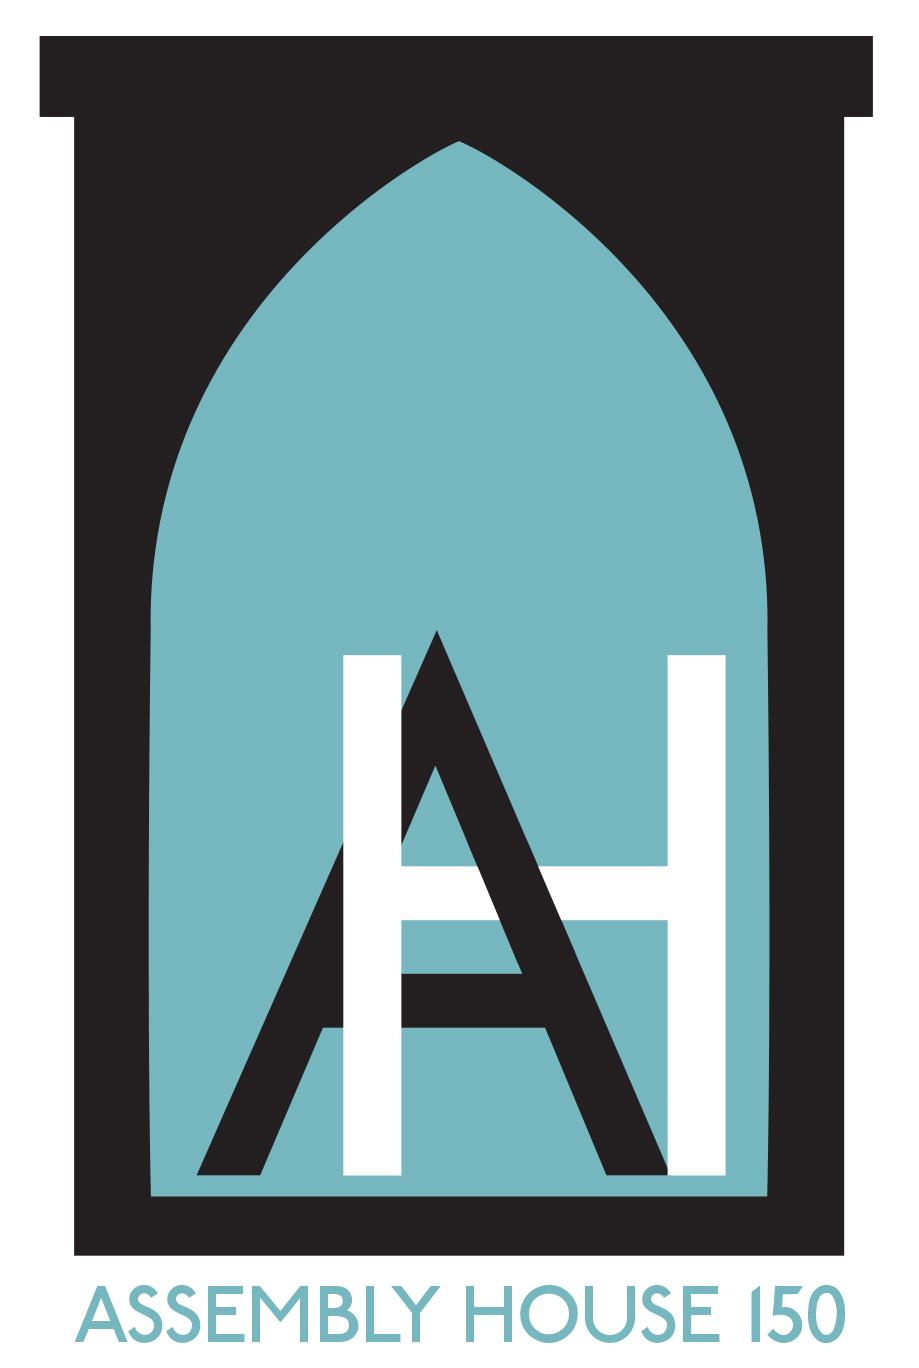 AH-logo-blue-type.jpg